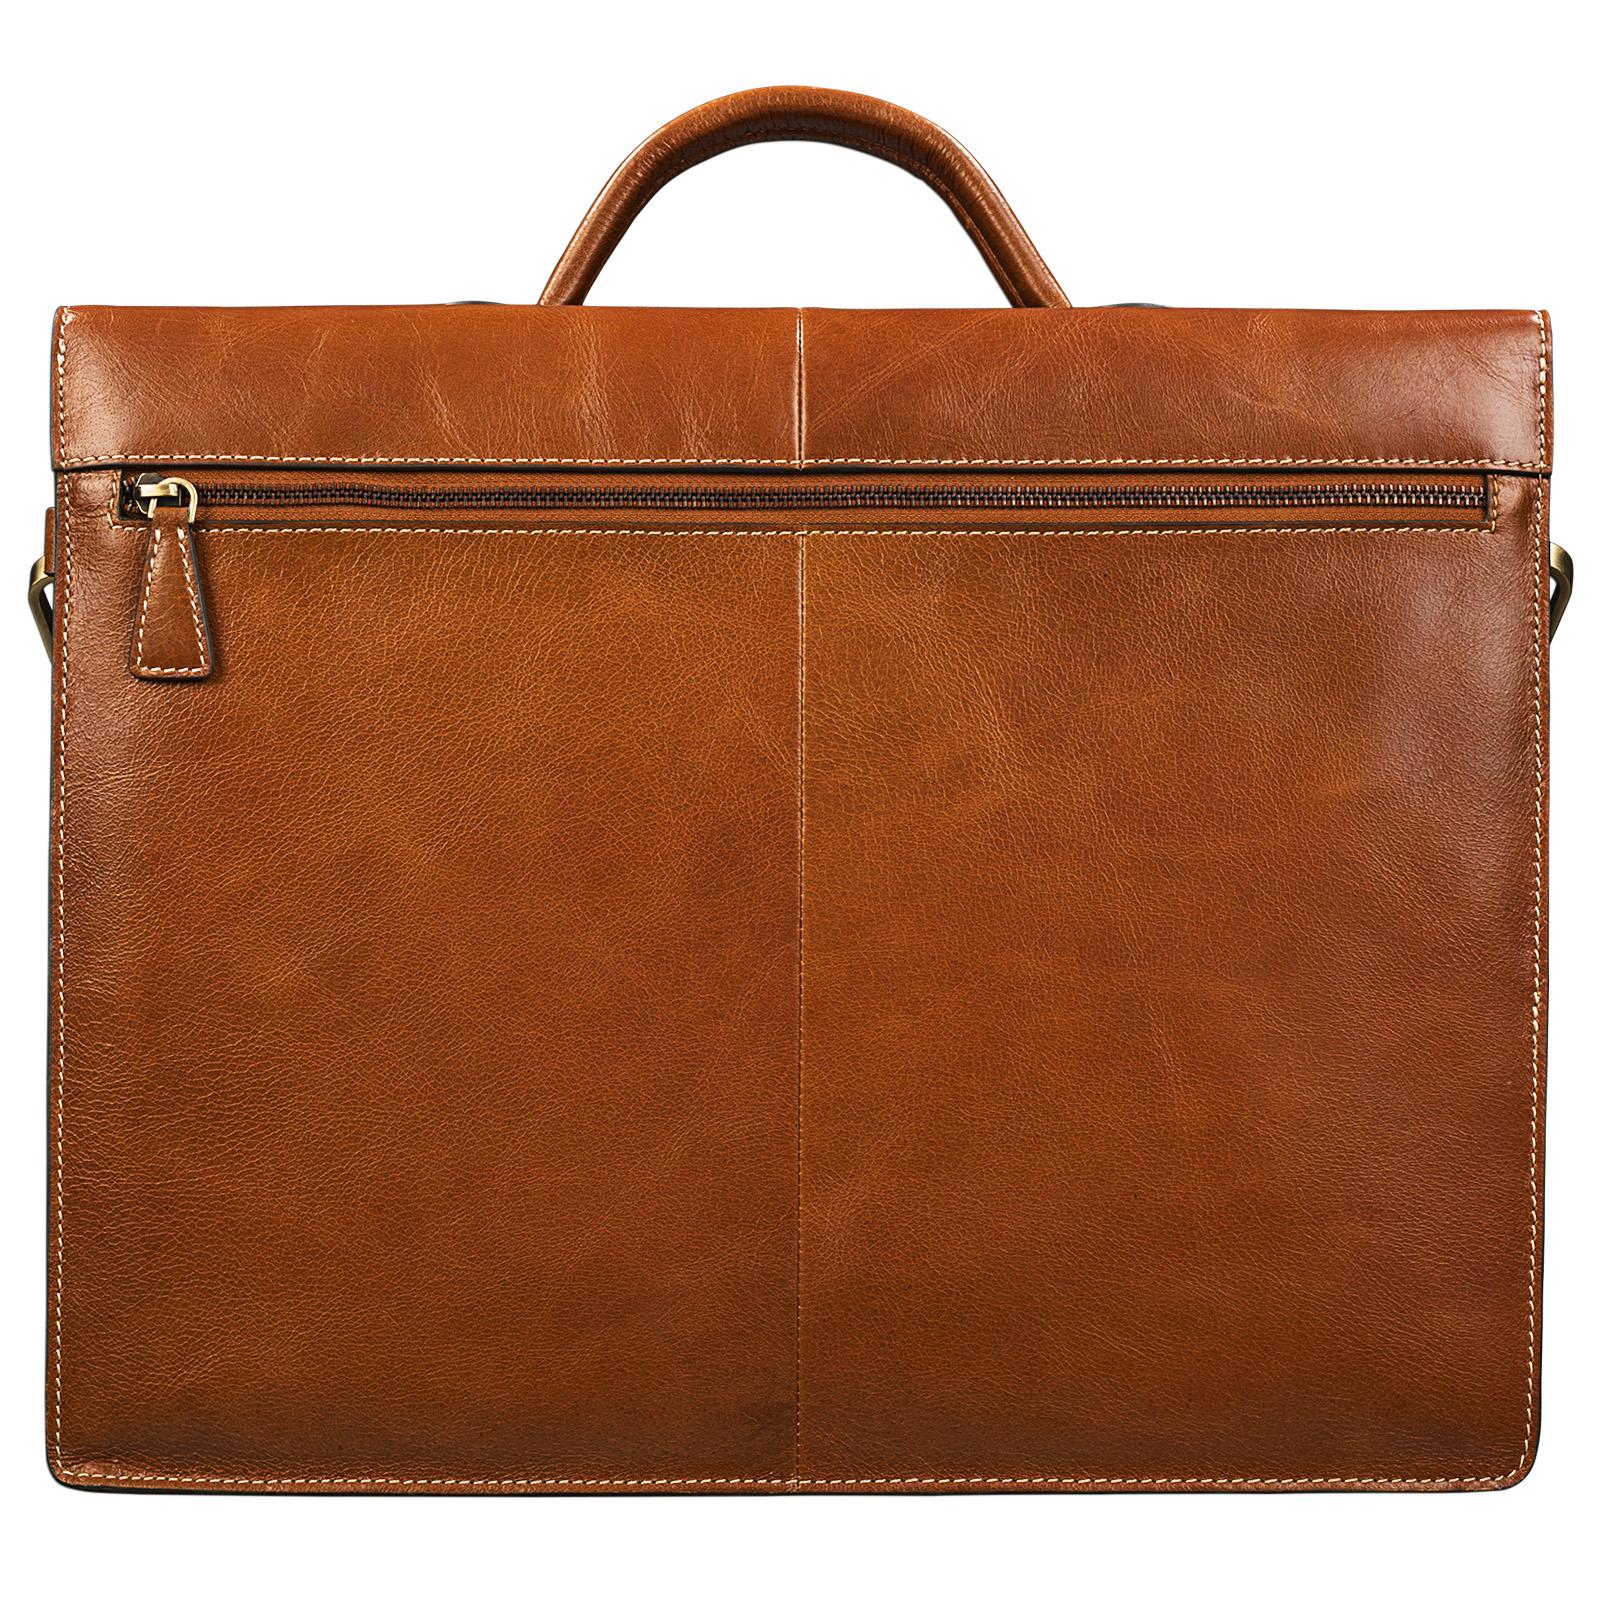 "STILORD ""Lorenz"" Vintage Aktentasche Leder groß Herren Damen Lehrer Business Bürotasche 15,6 Zoll DIN A4 echtes Leder cognac / braun - Bild 5"